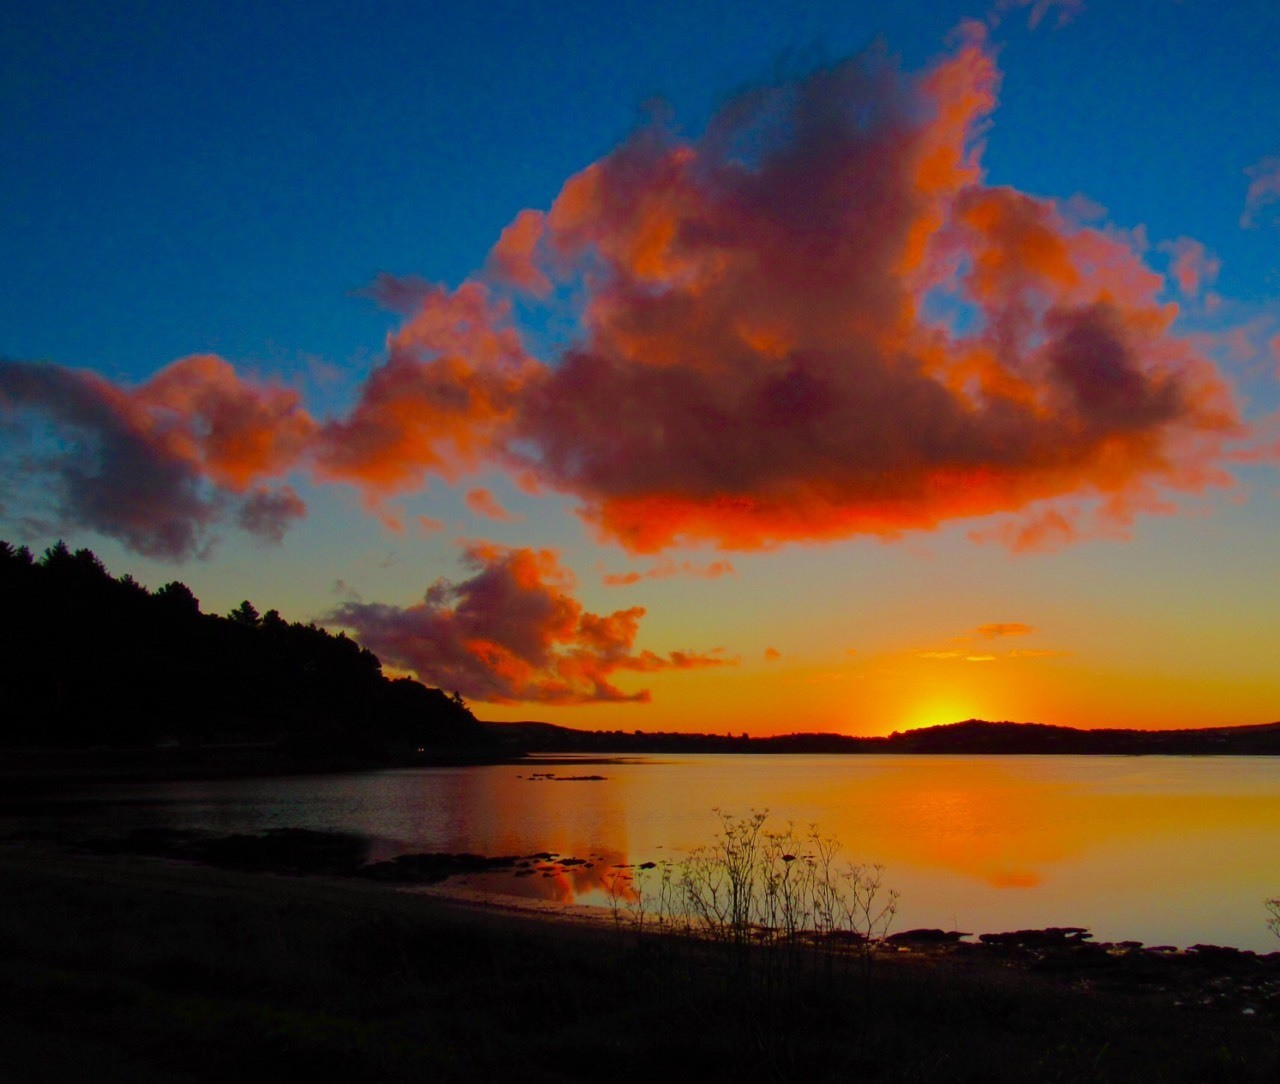 Parramatta Inlet, sunset over calm waters